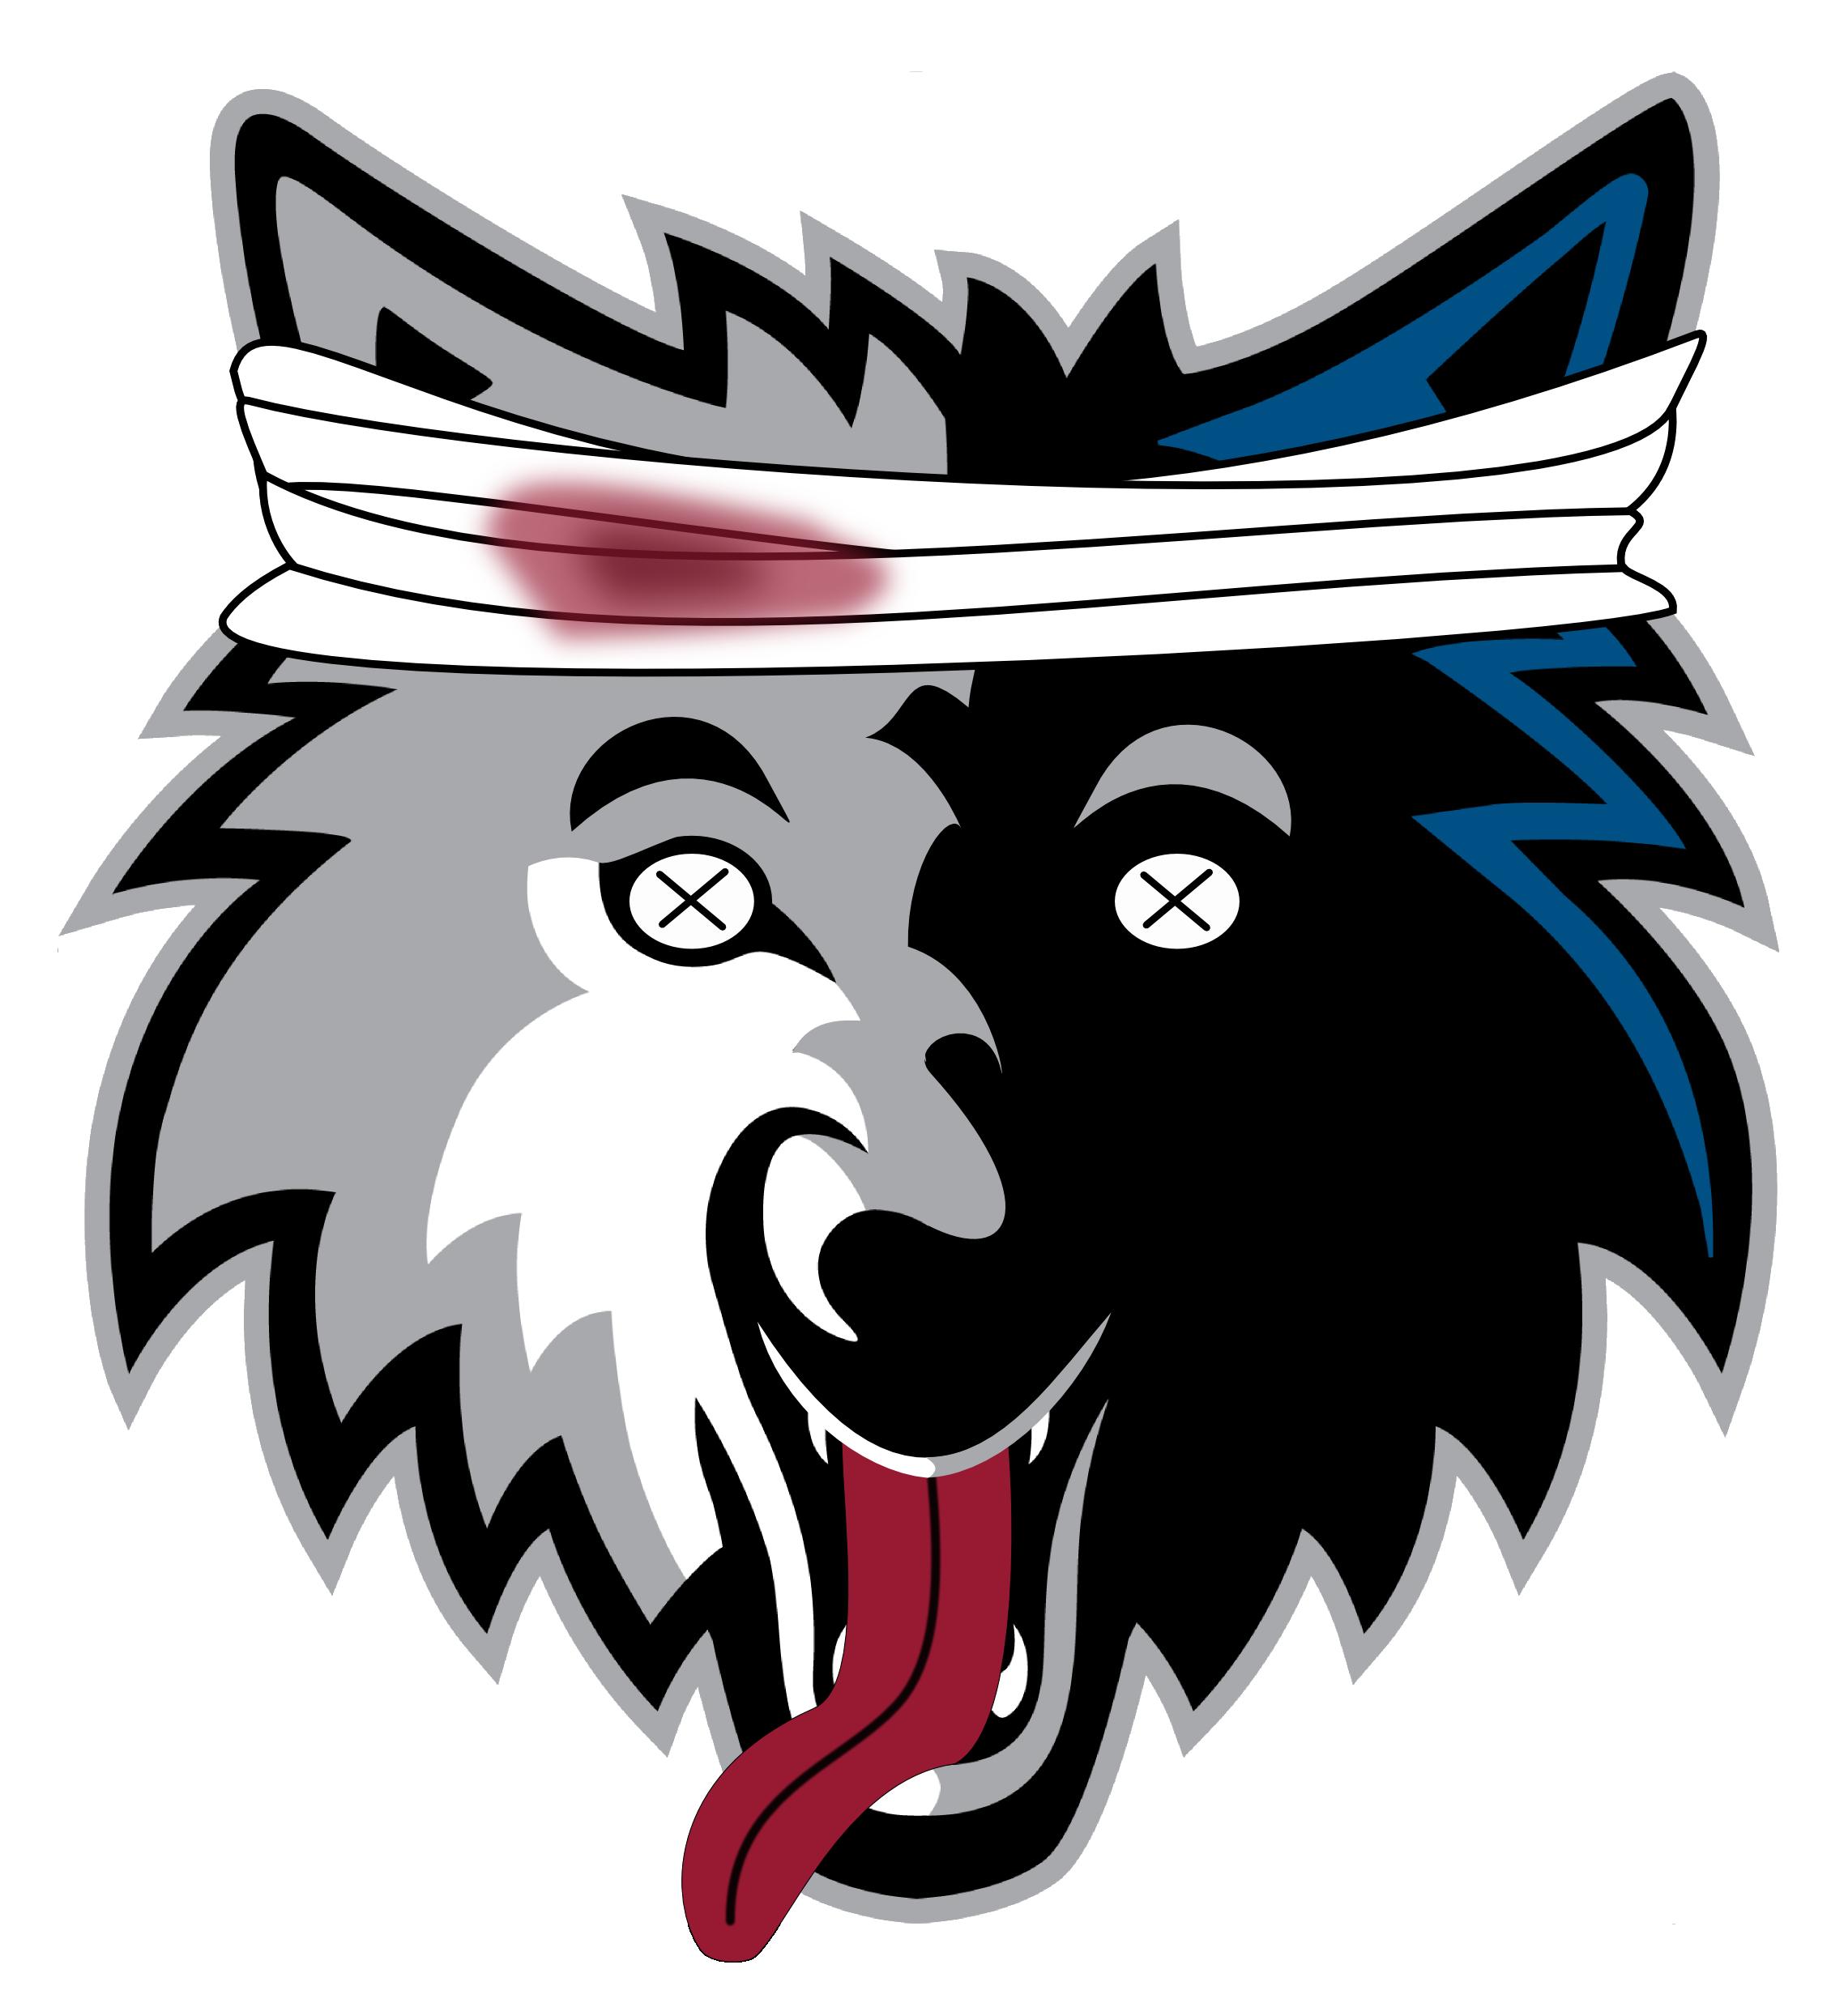 картинки для логотипа клана стилисты рекомендуют